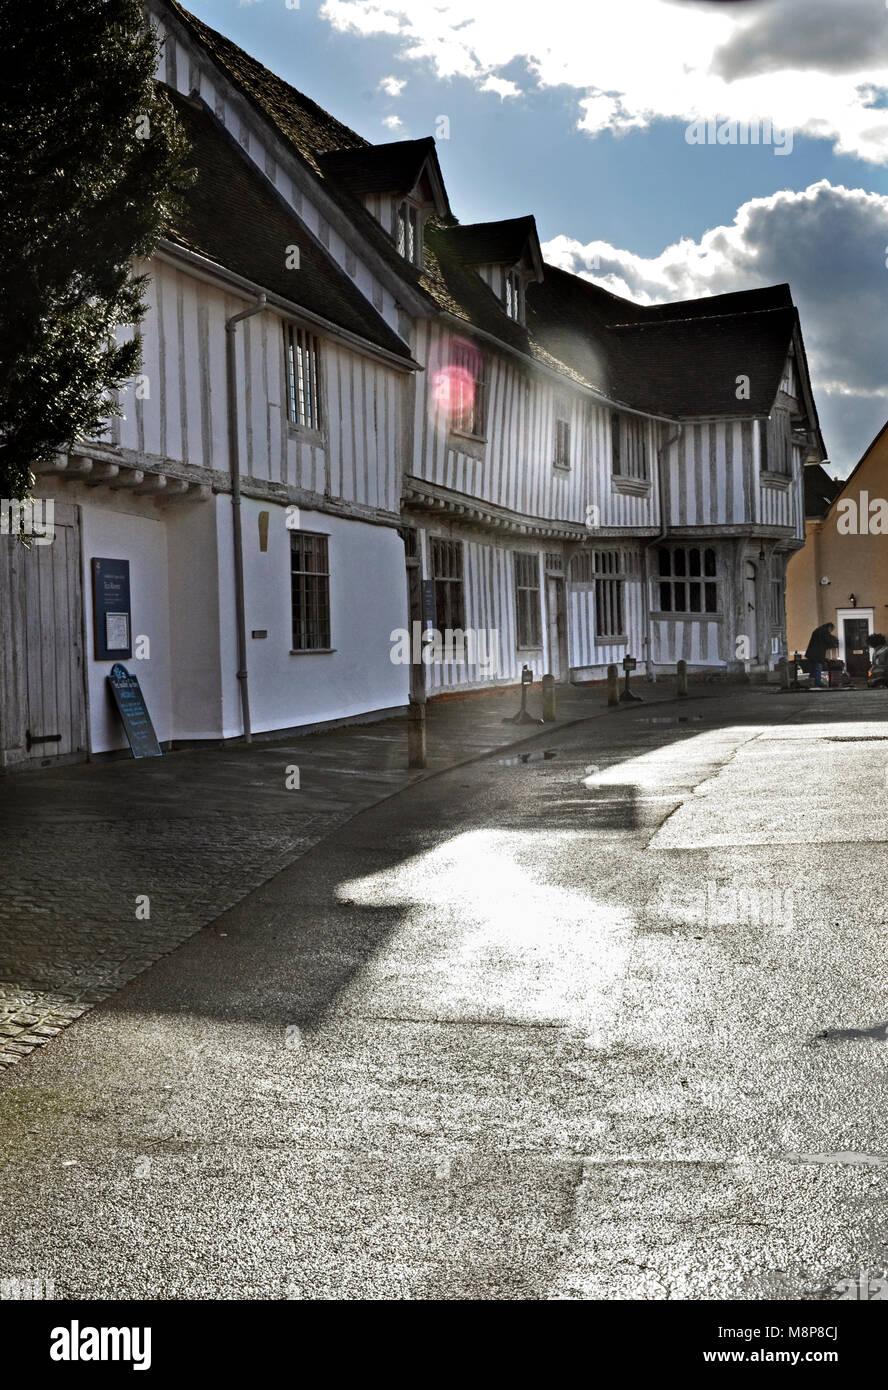 the guildhall lavenham suffolk england uk - Stock Image